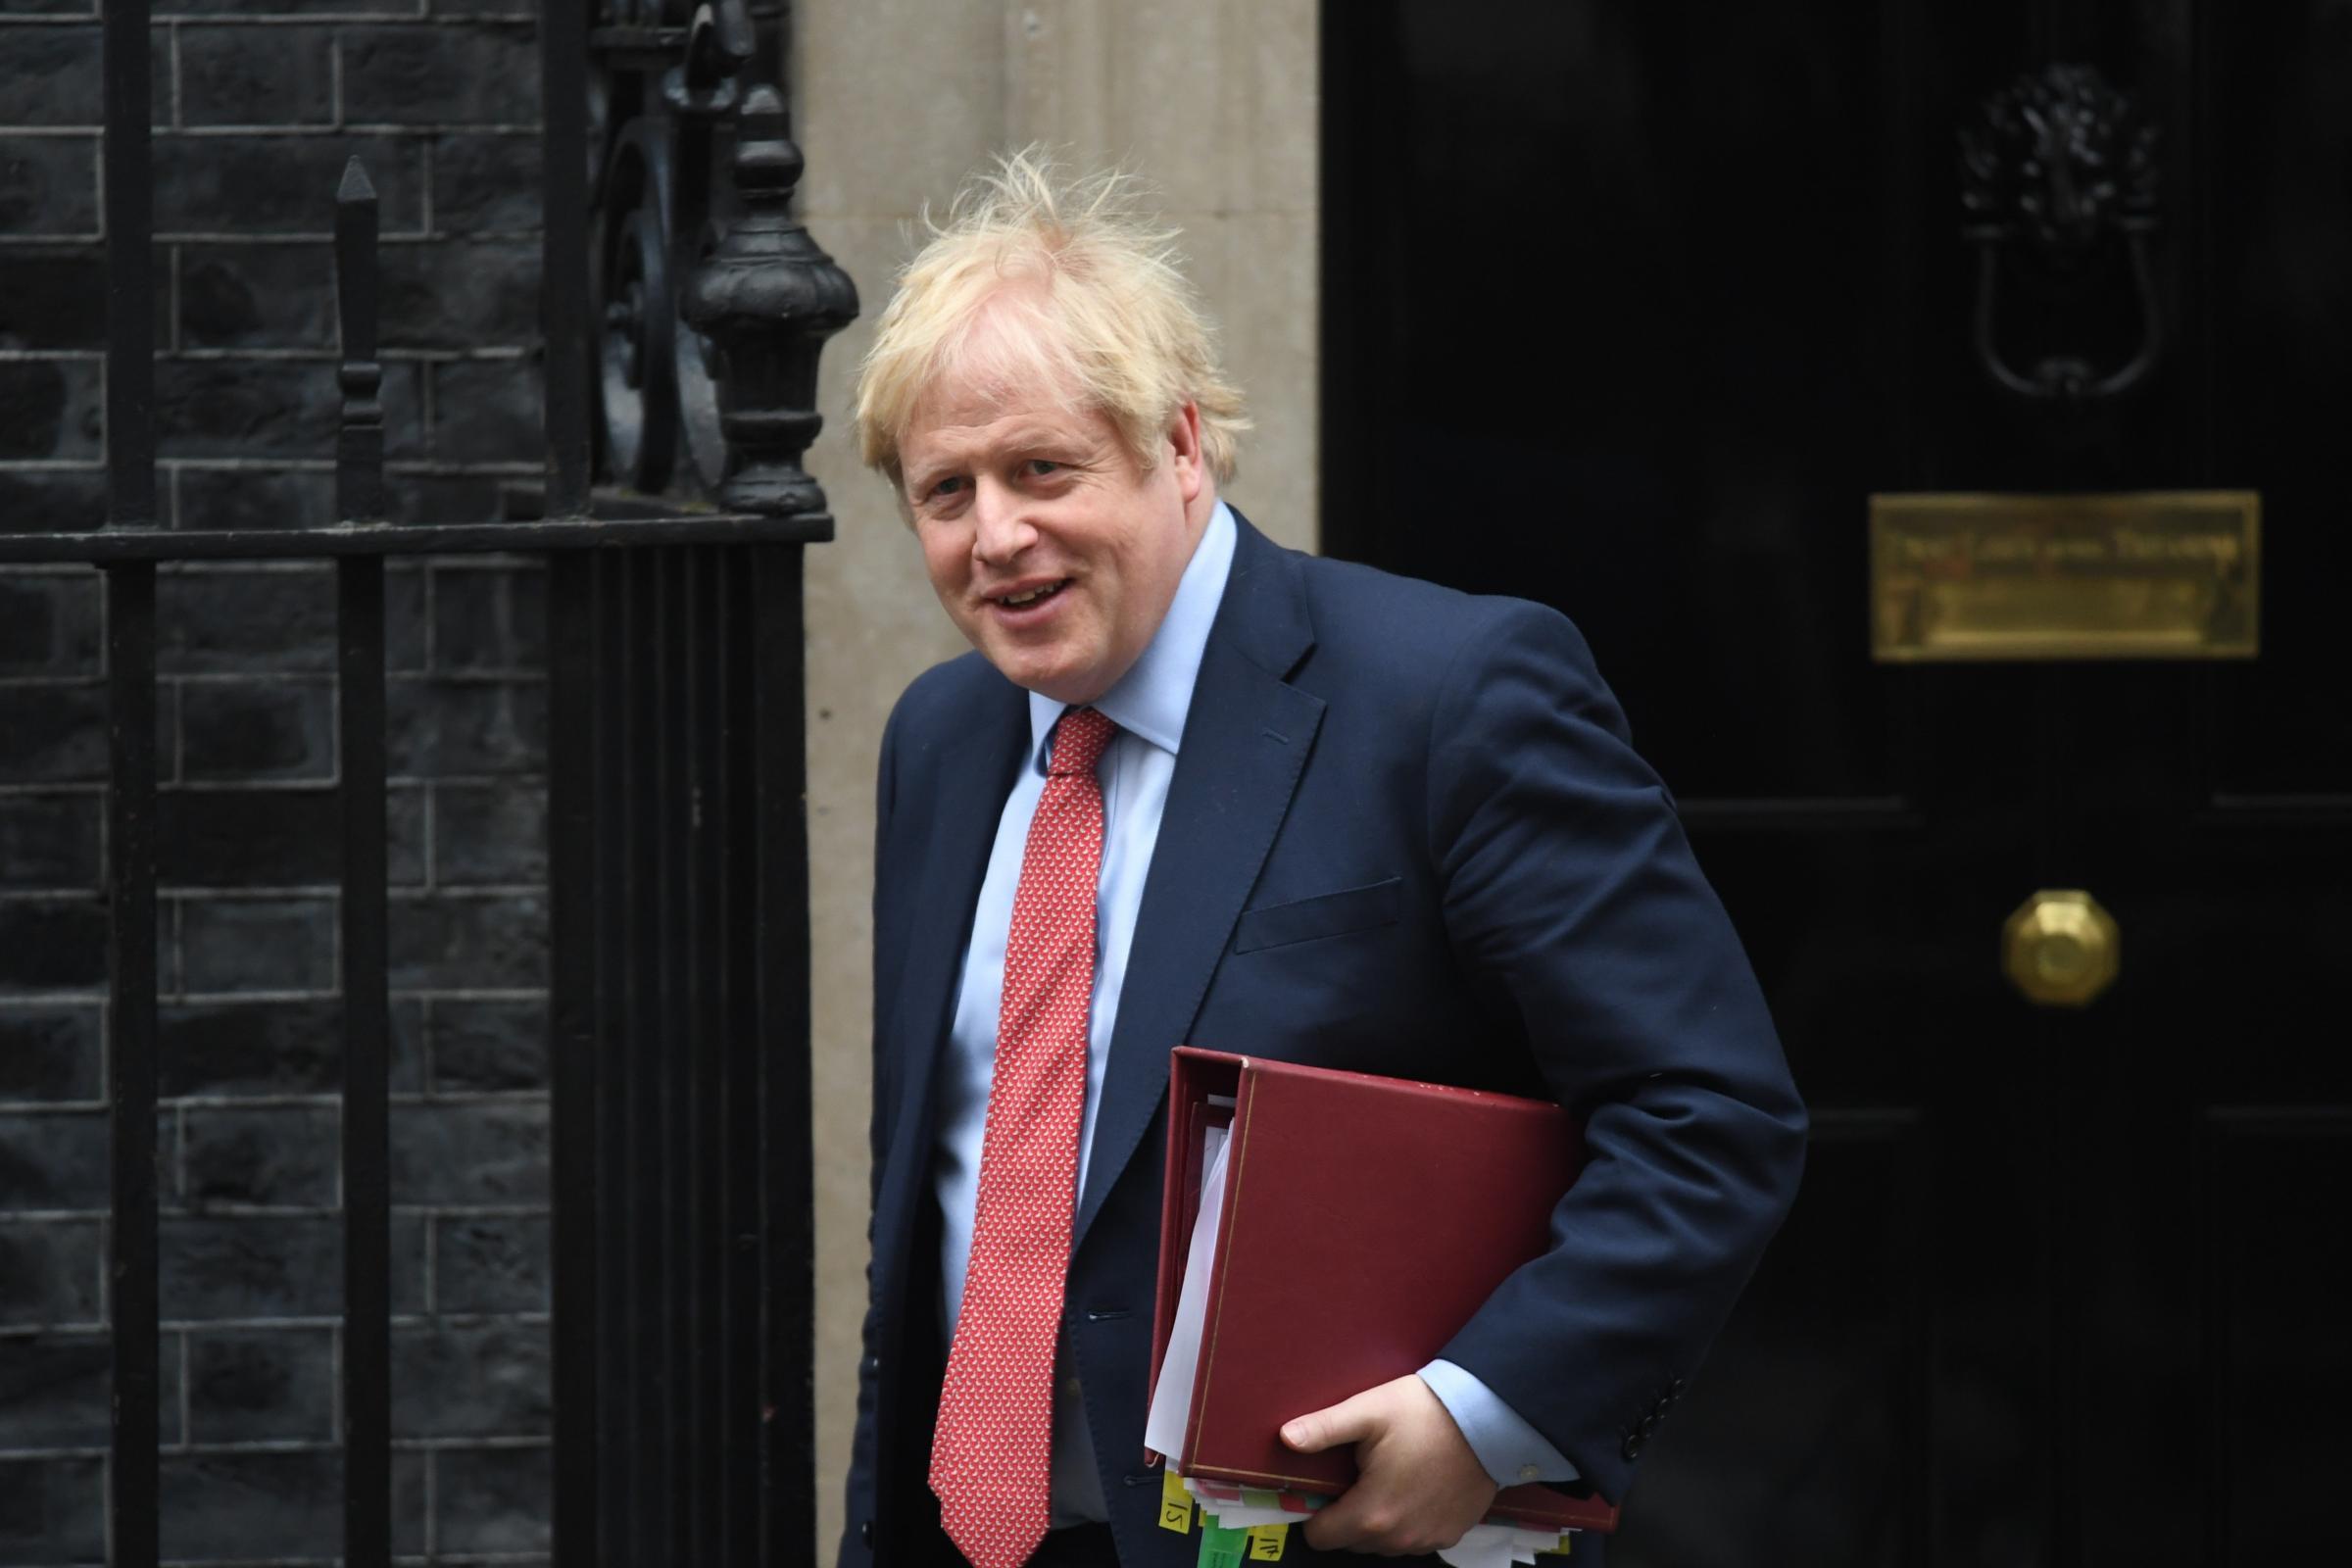 WATCH: Boris Johnson exposes hypocrisy over Scottish visa plan